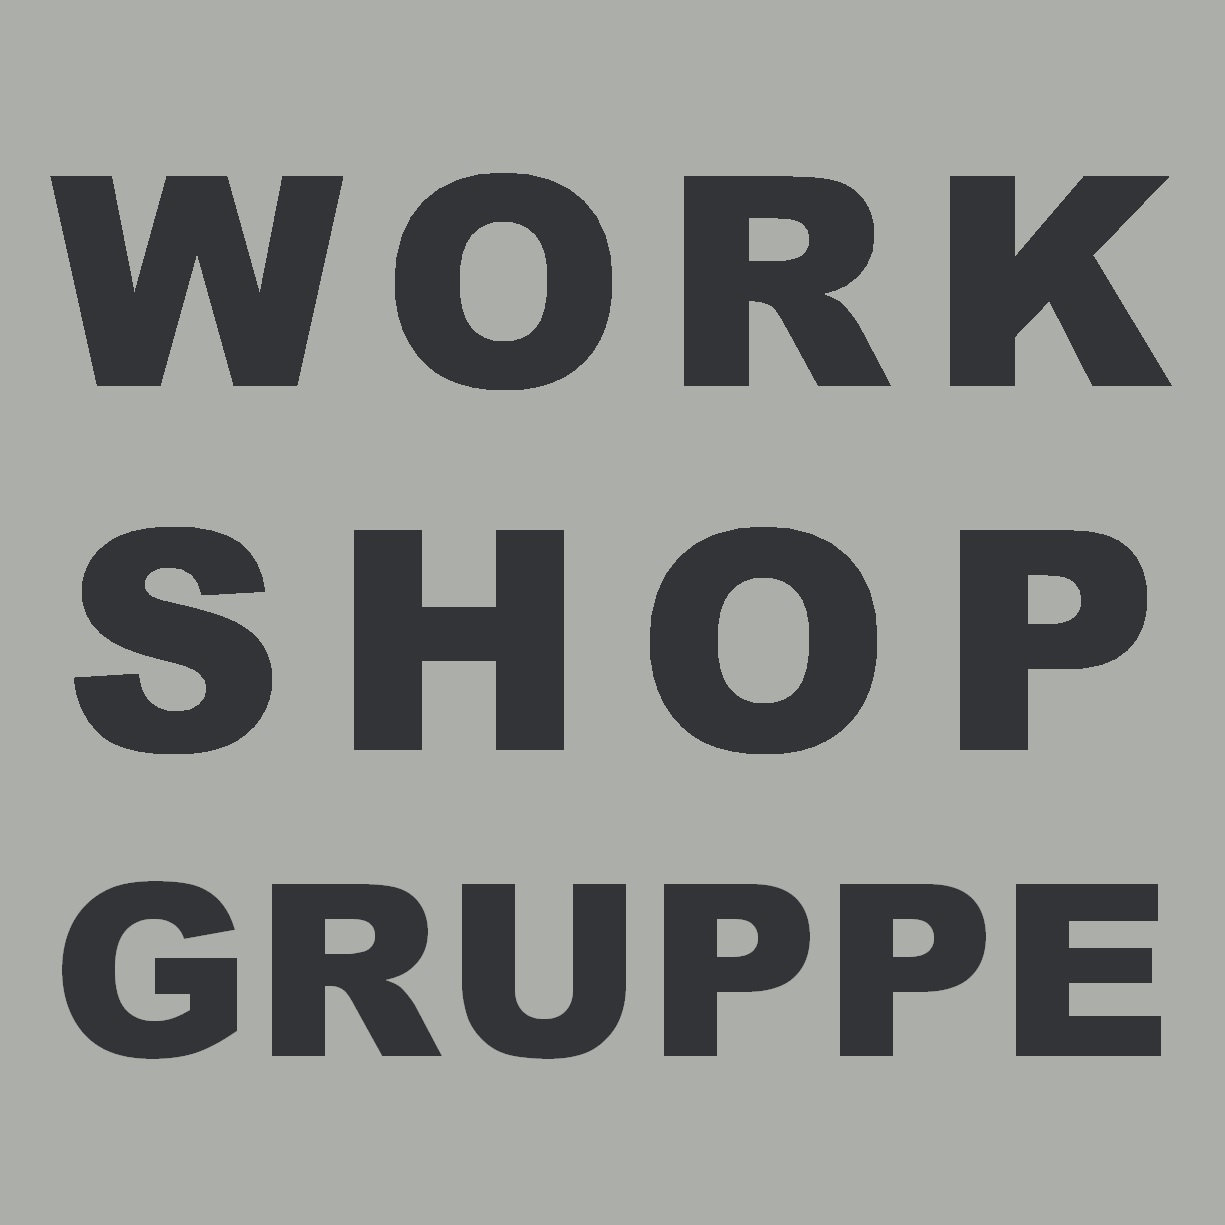 Porzellan Workshop Gruppe (nach Corona)